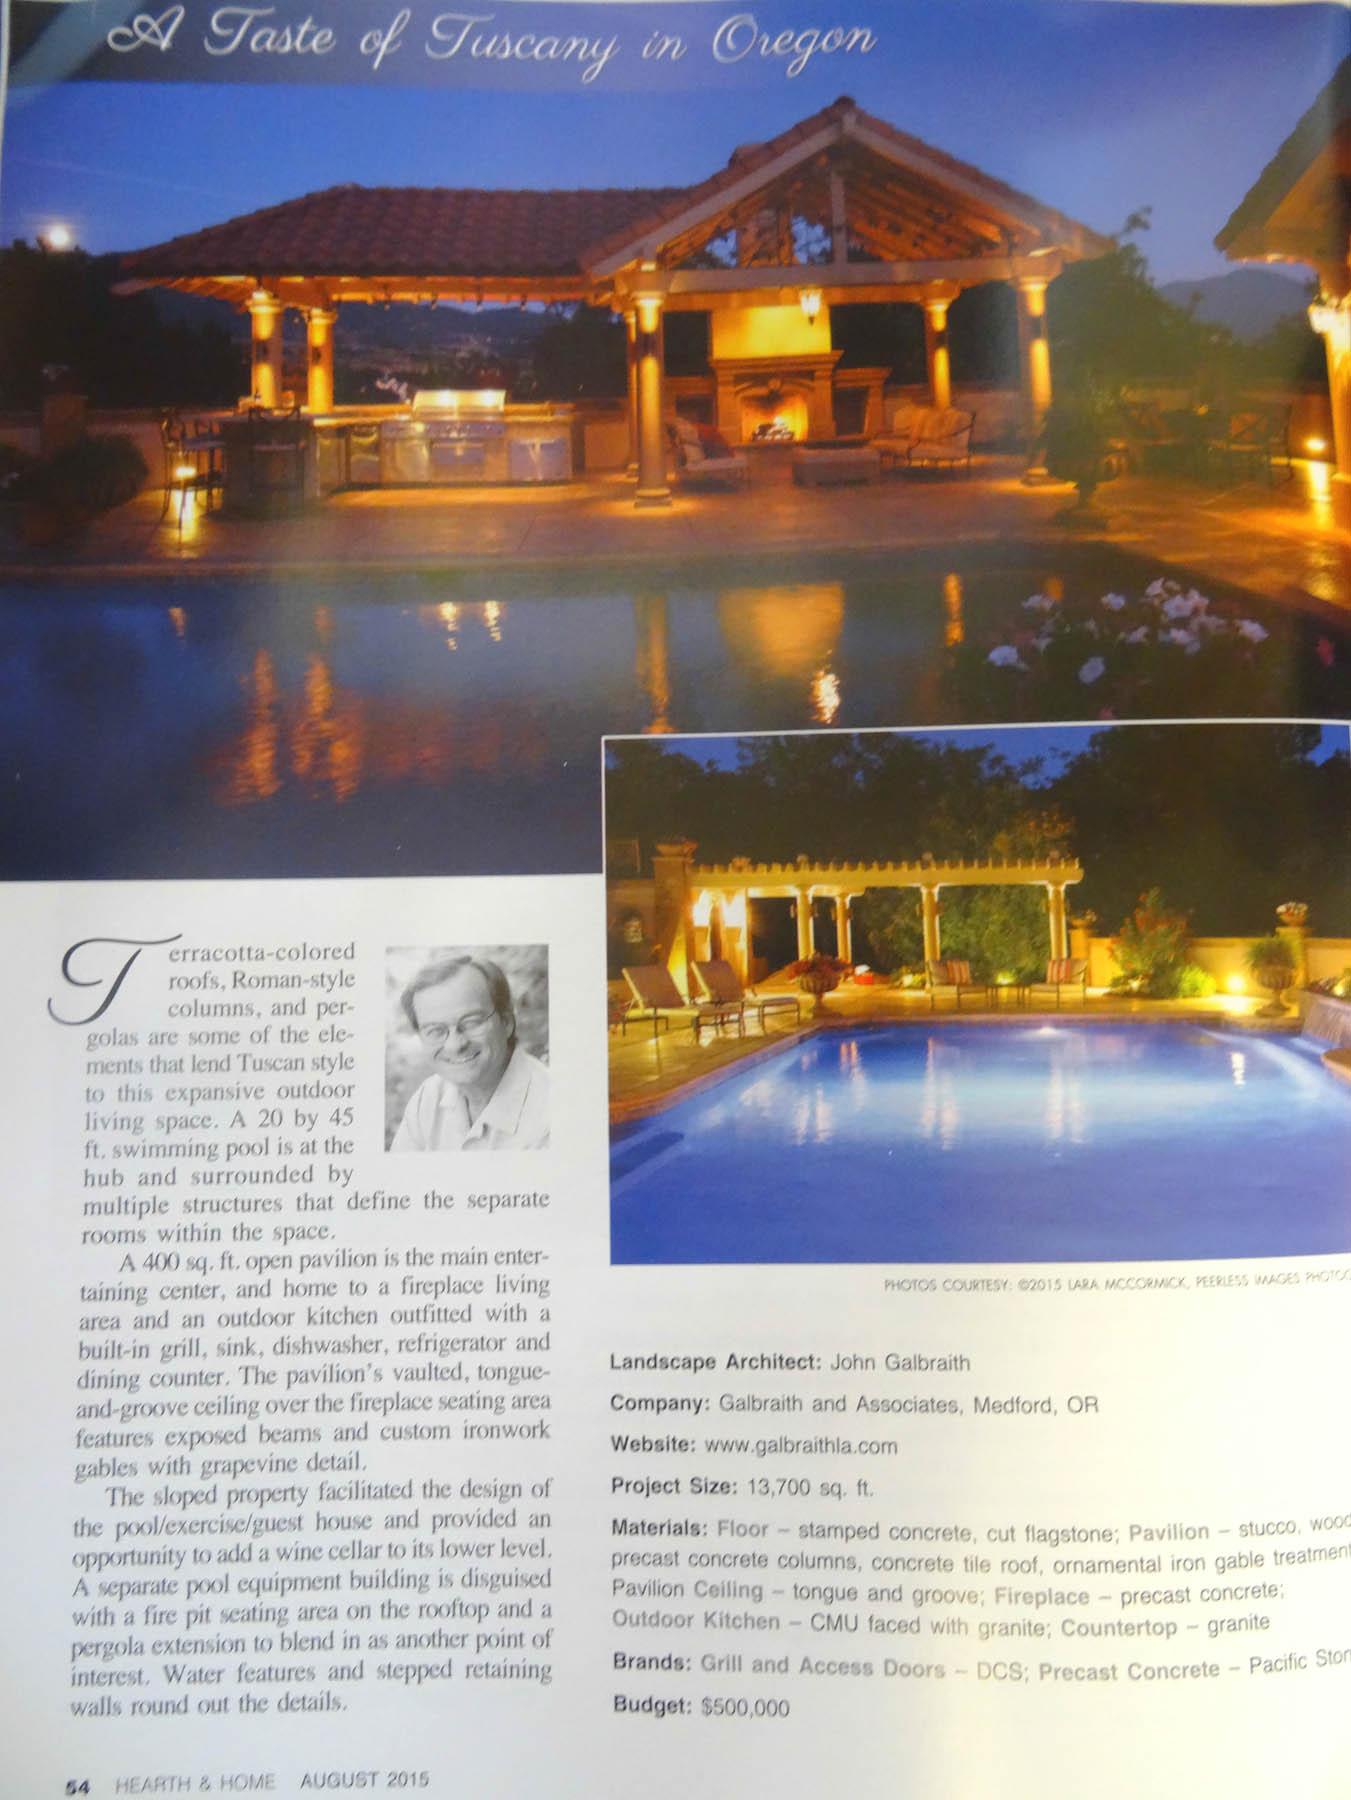 10 b Hearth & Home Magazineweb.jpg